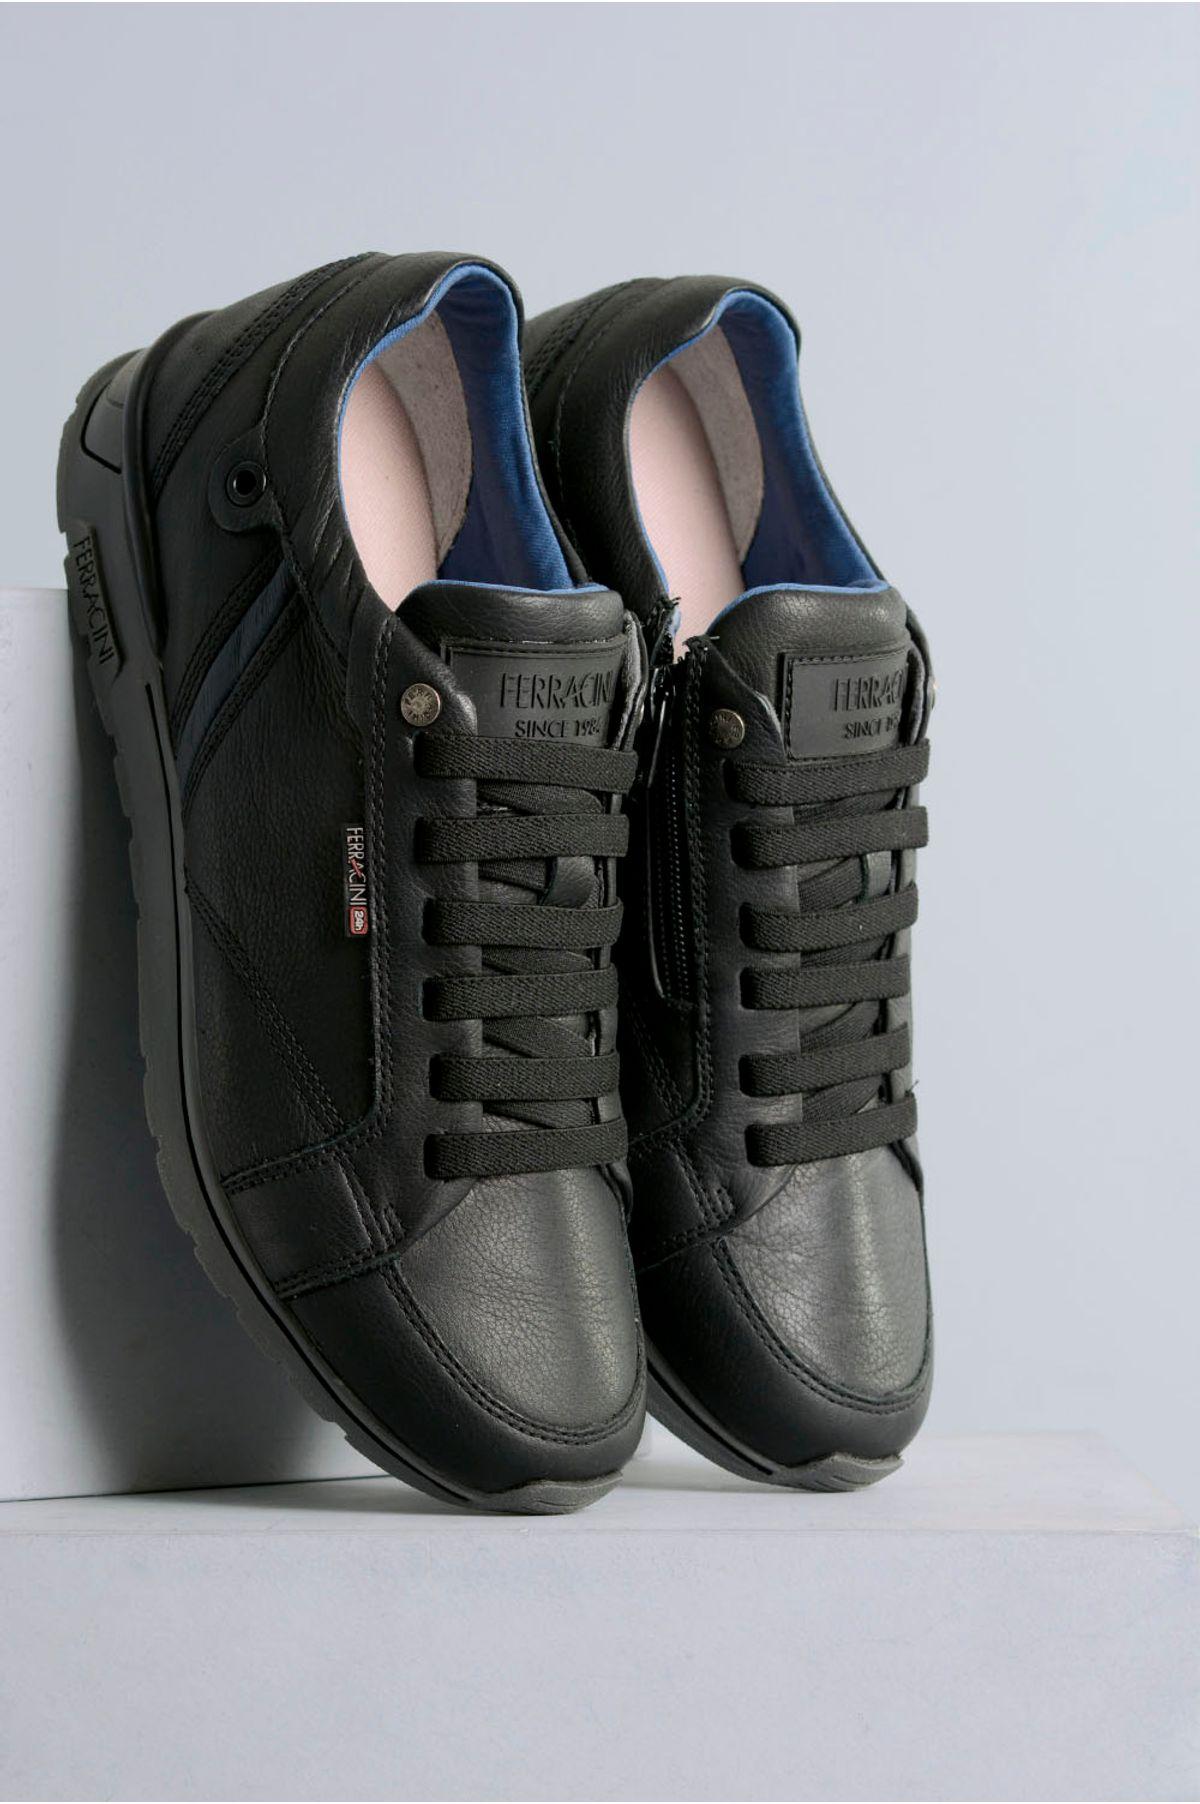 9df71adb7c Sapatênis Masculino Ferracini Califa CR-PRETO - Mundial Calçados